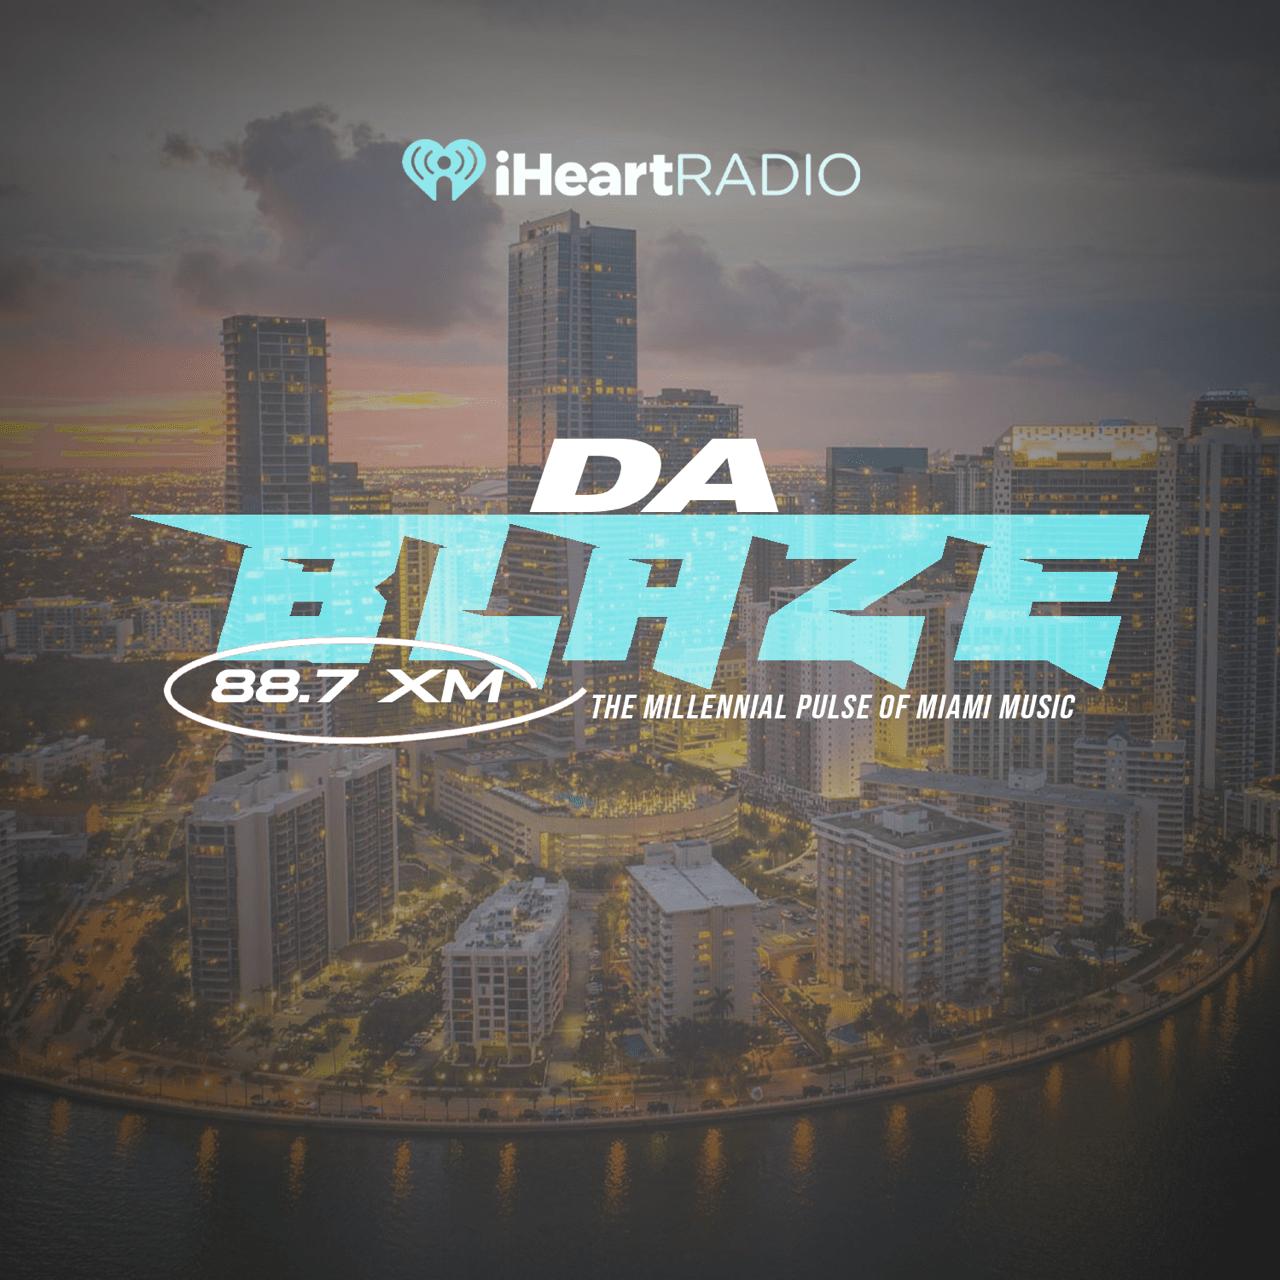 Art for DA BLAZE 88.7 XM iHeartRadio Drop  by DRUMMABOY